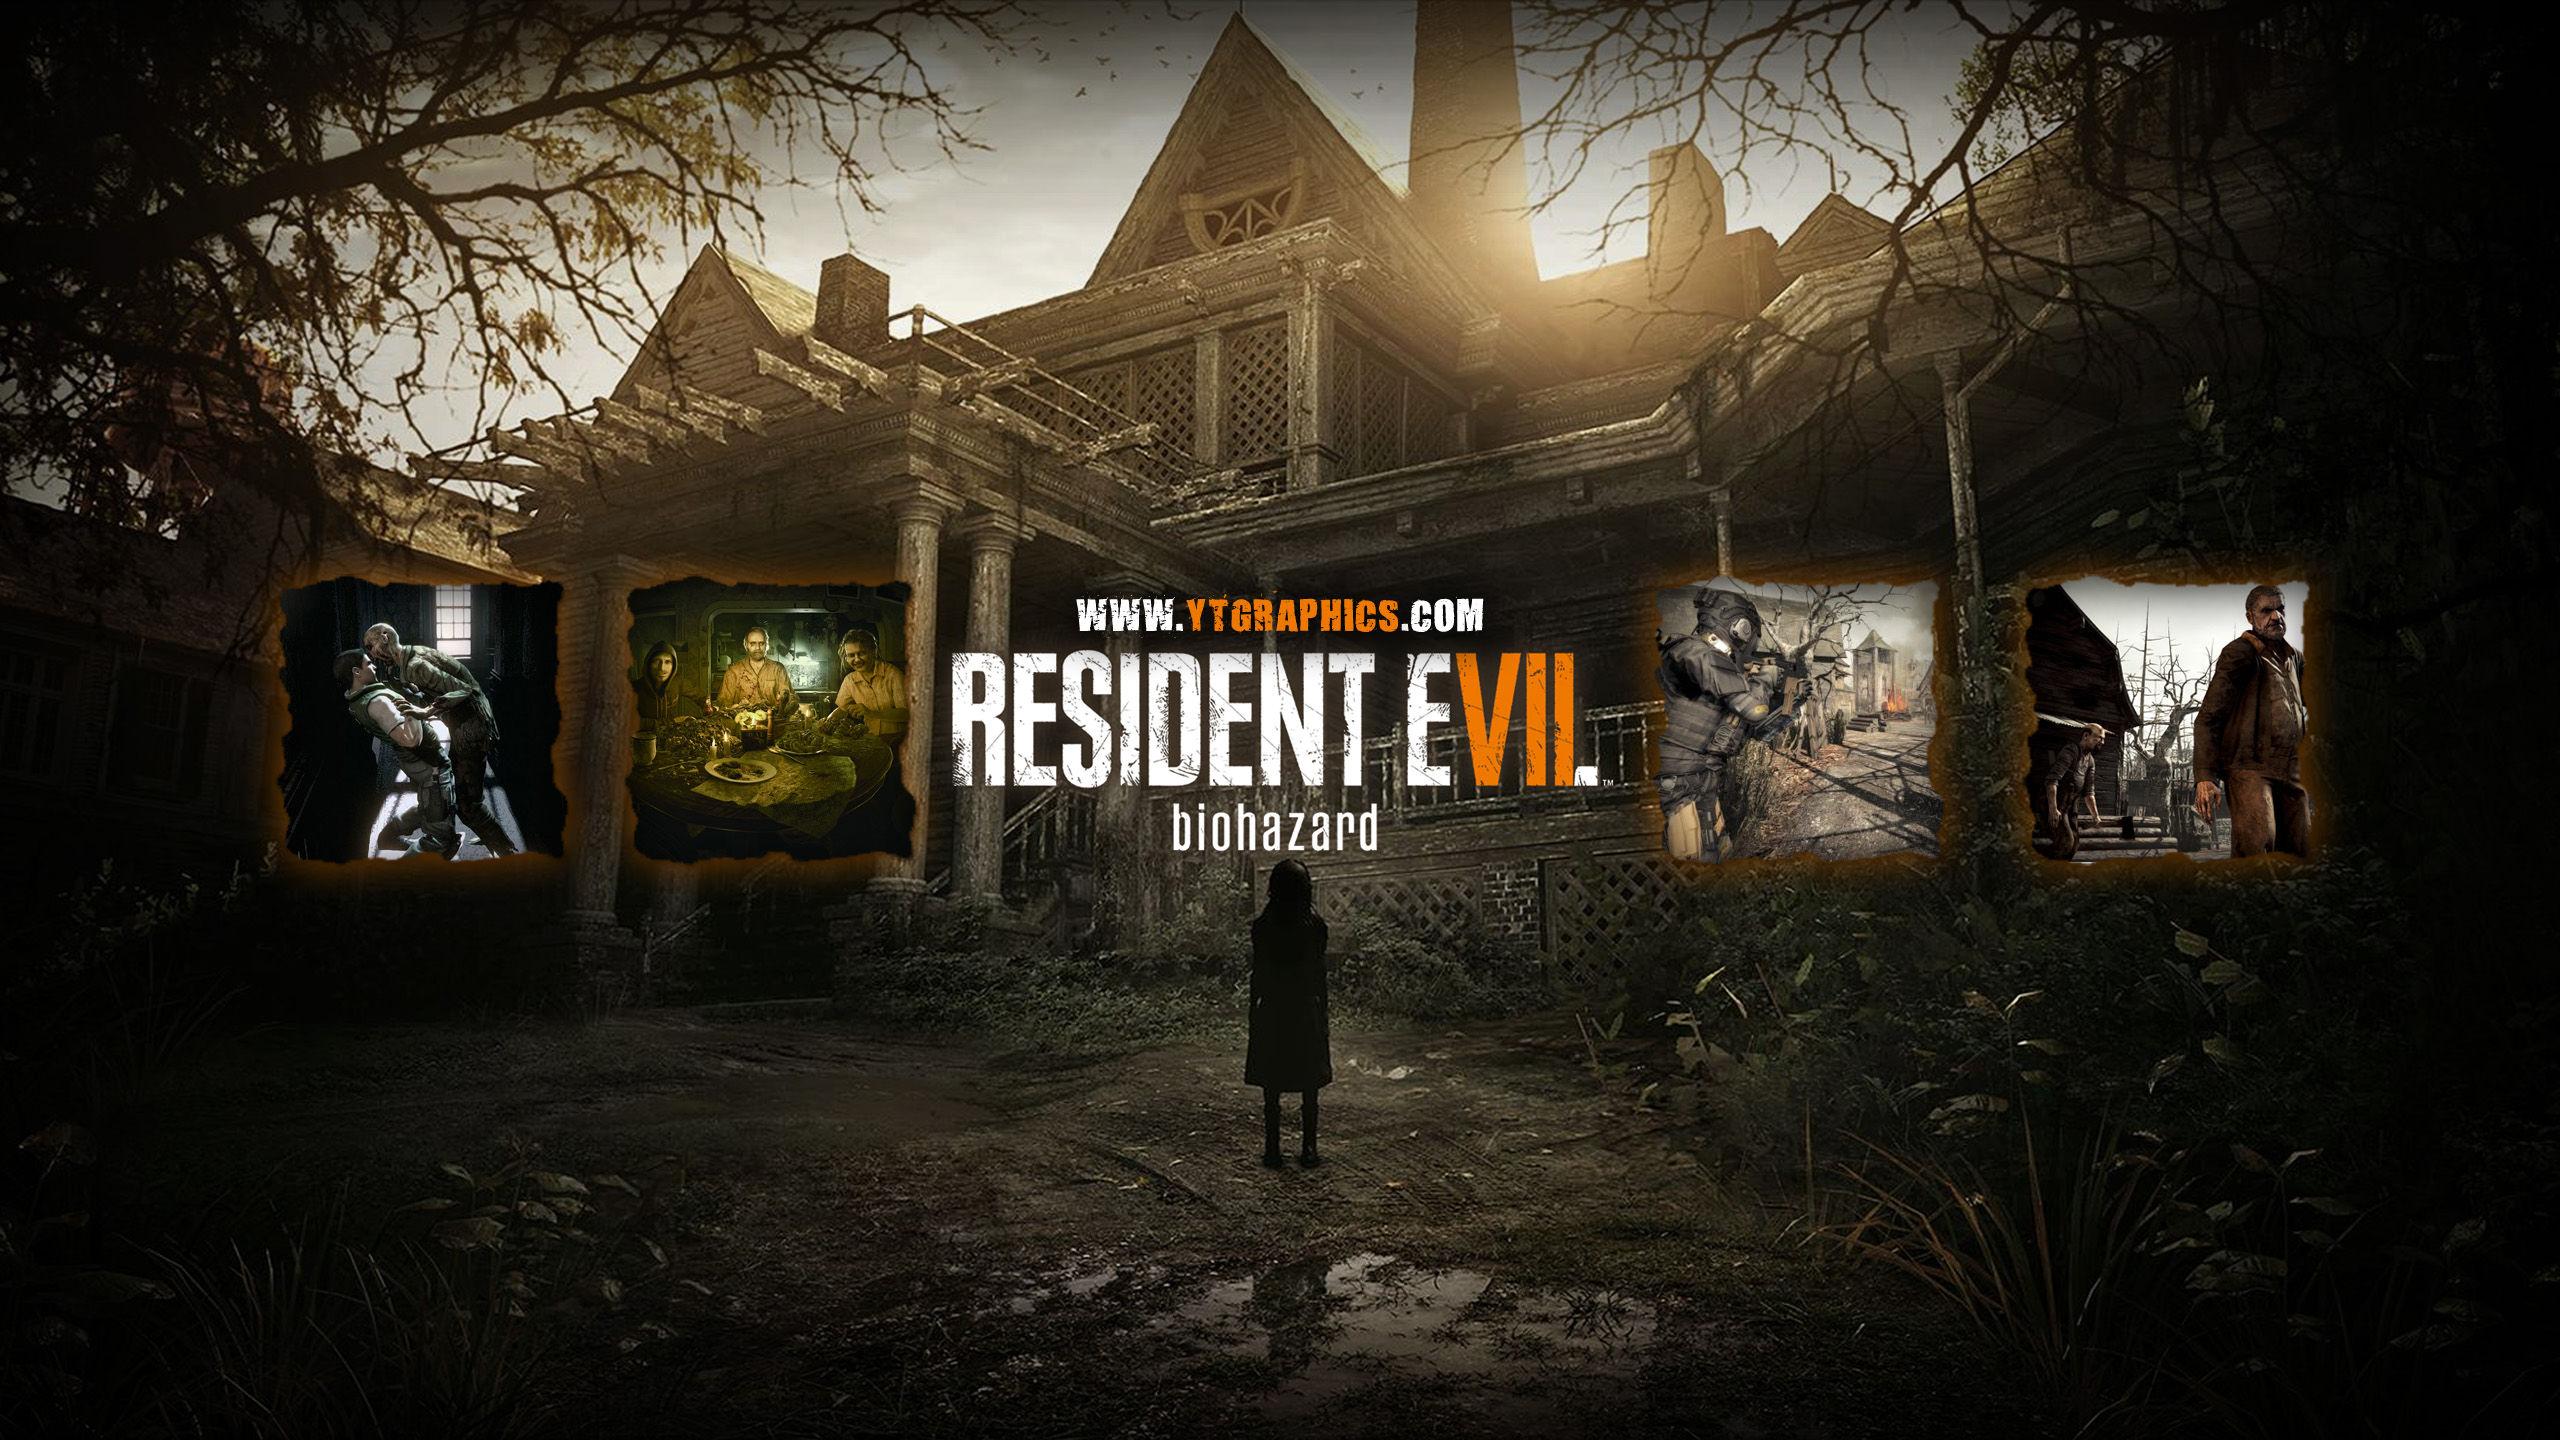 Resident Evil 7 Biohazard YouTube Channel Art Banners